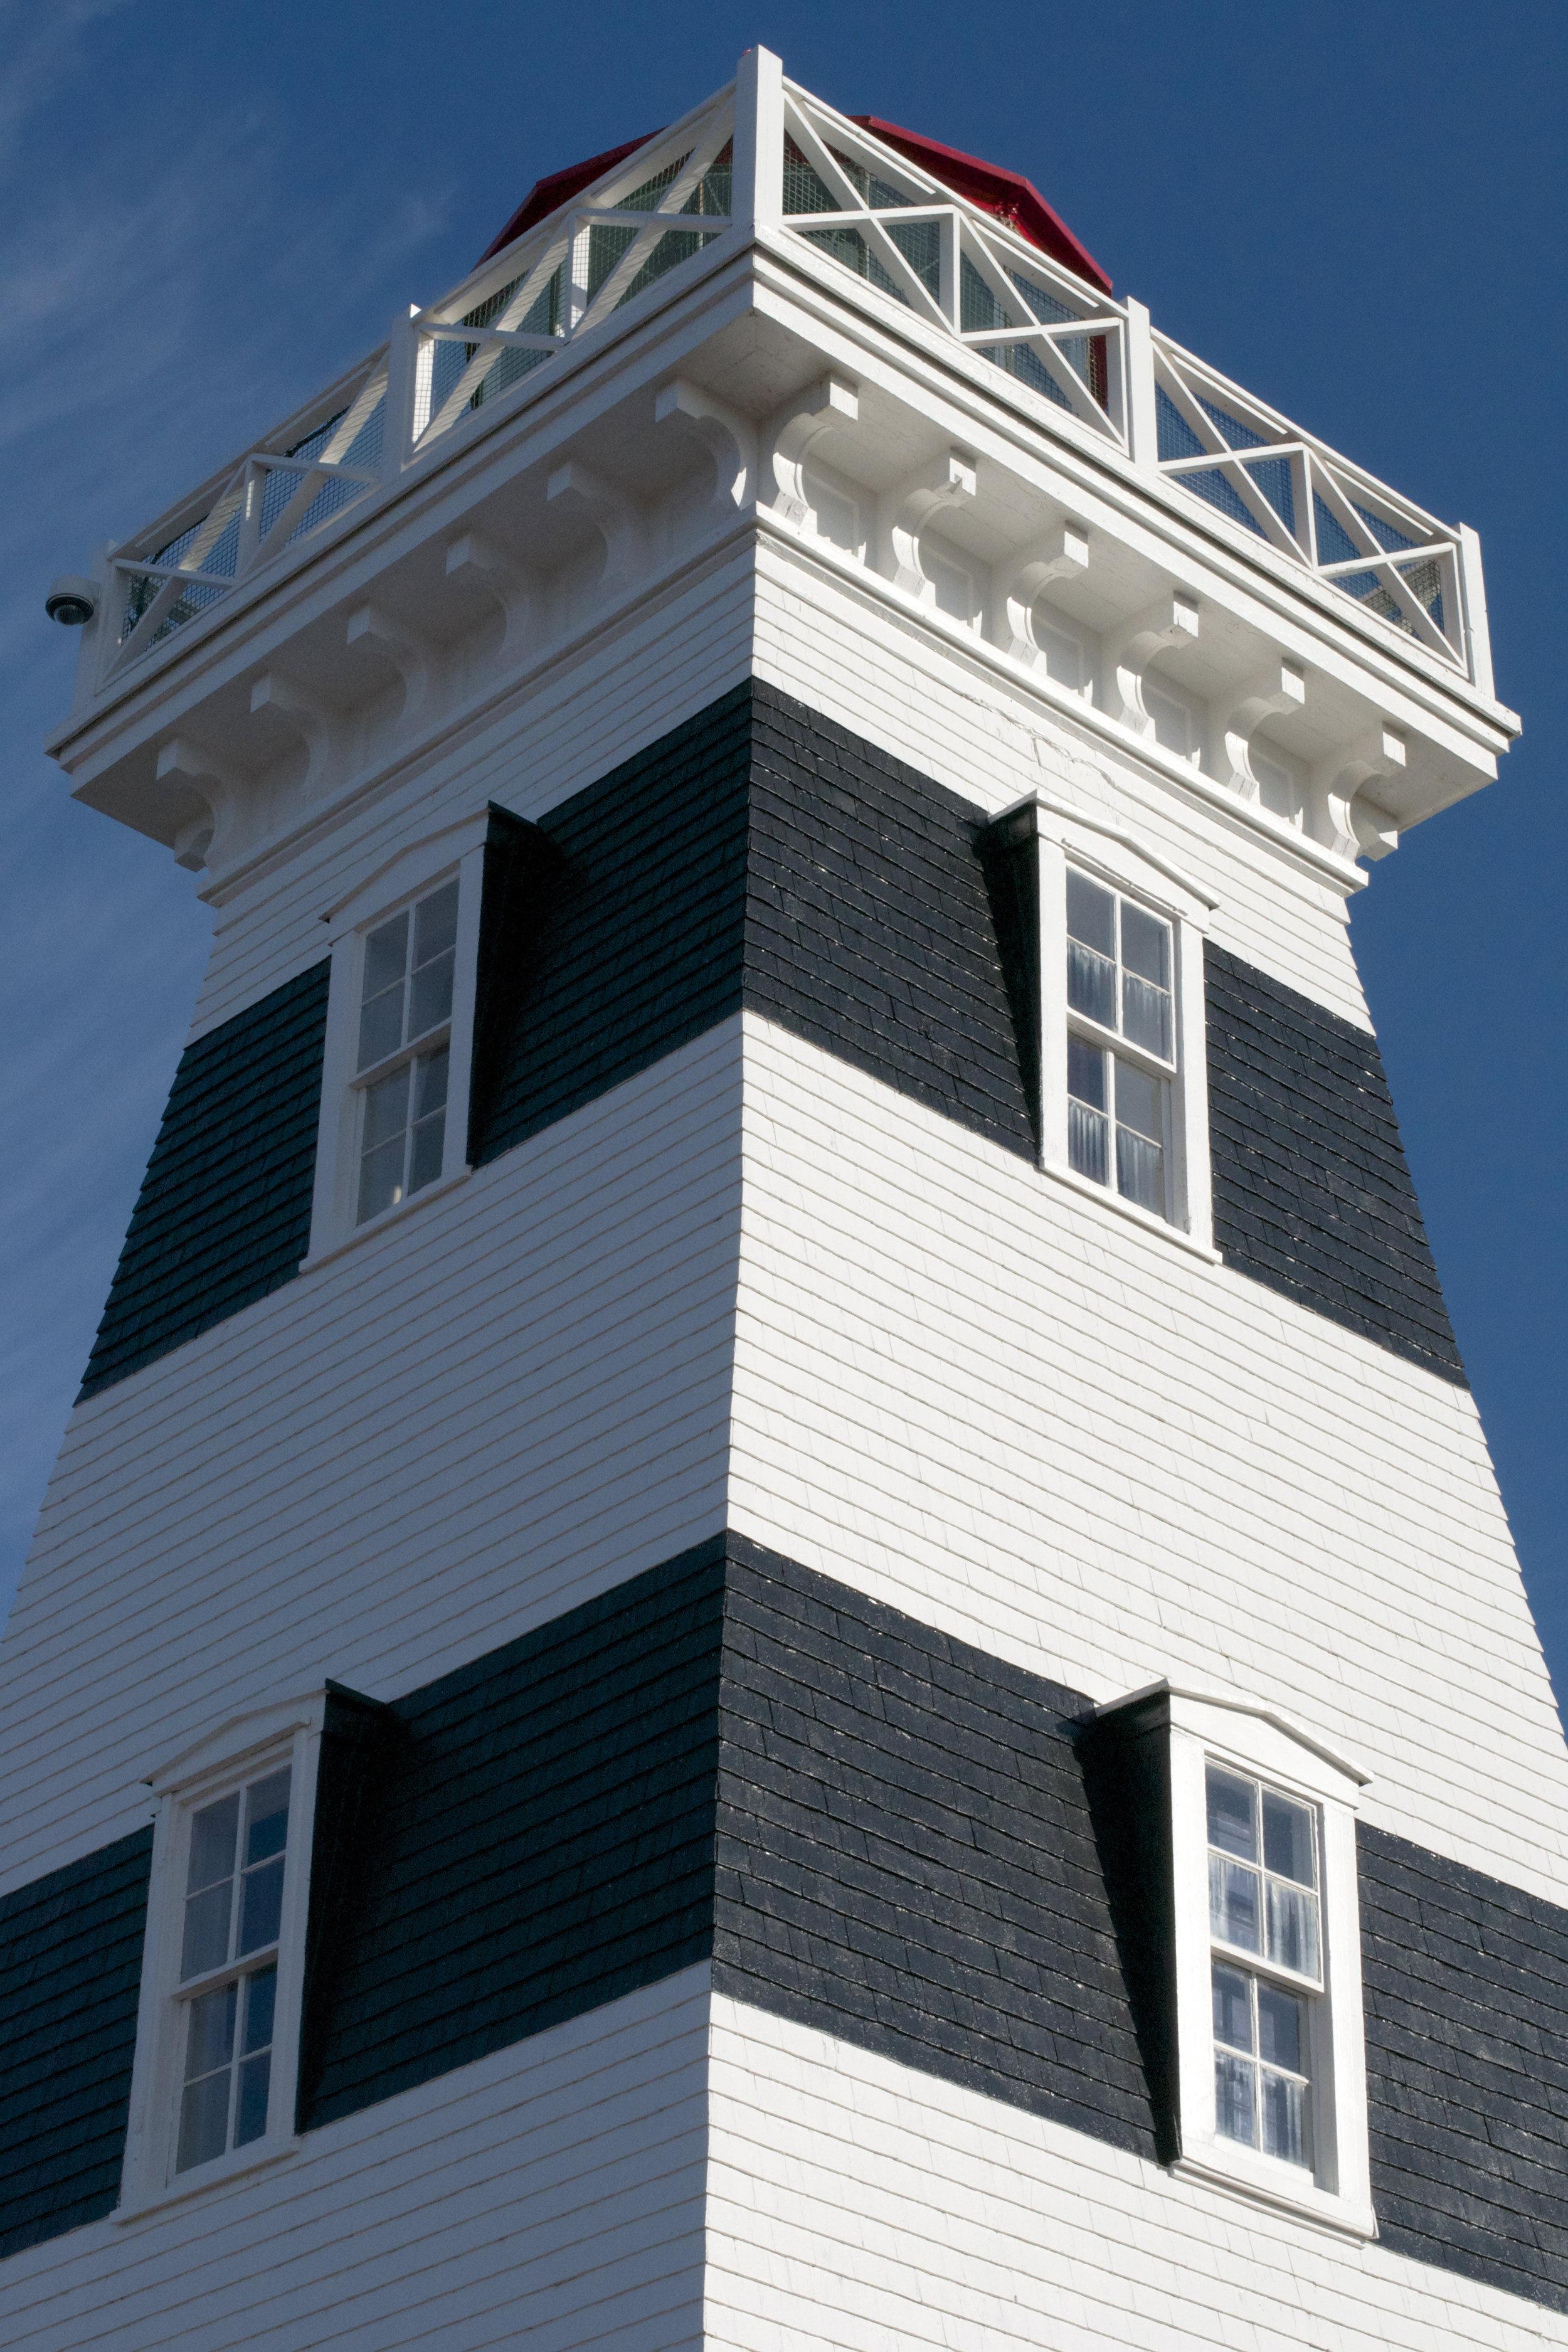 lighthouse-blue-blue-sky.jpg